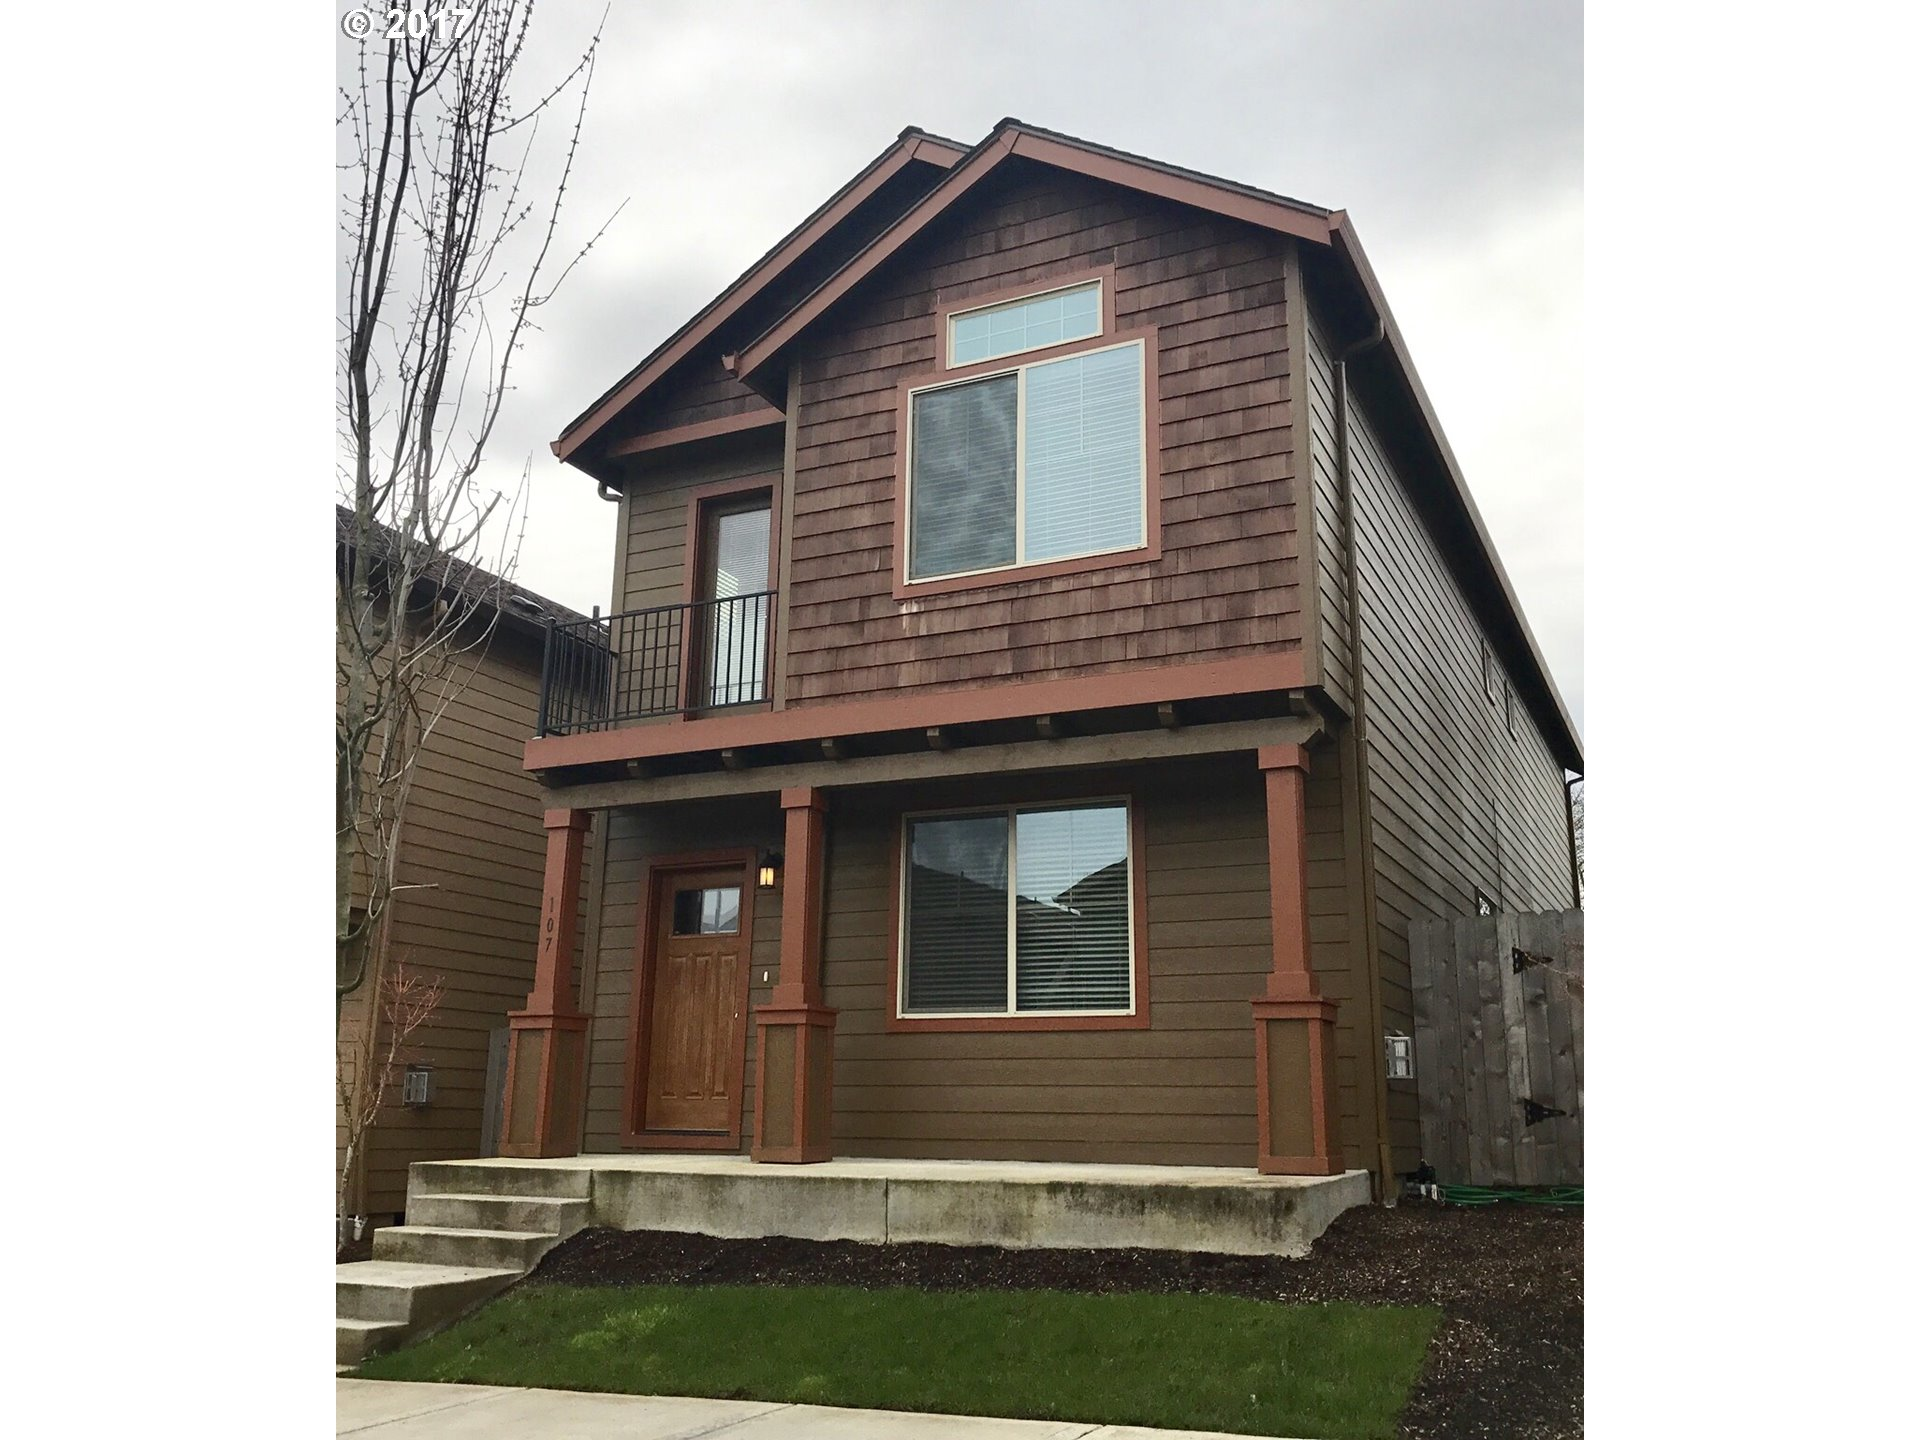 107 NE 76TH ST, Vancouver, WA 98665